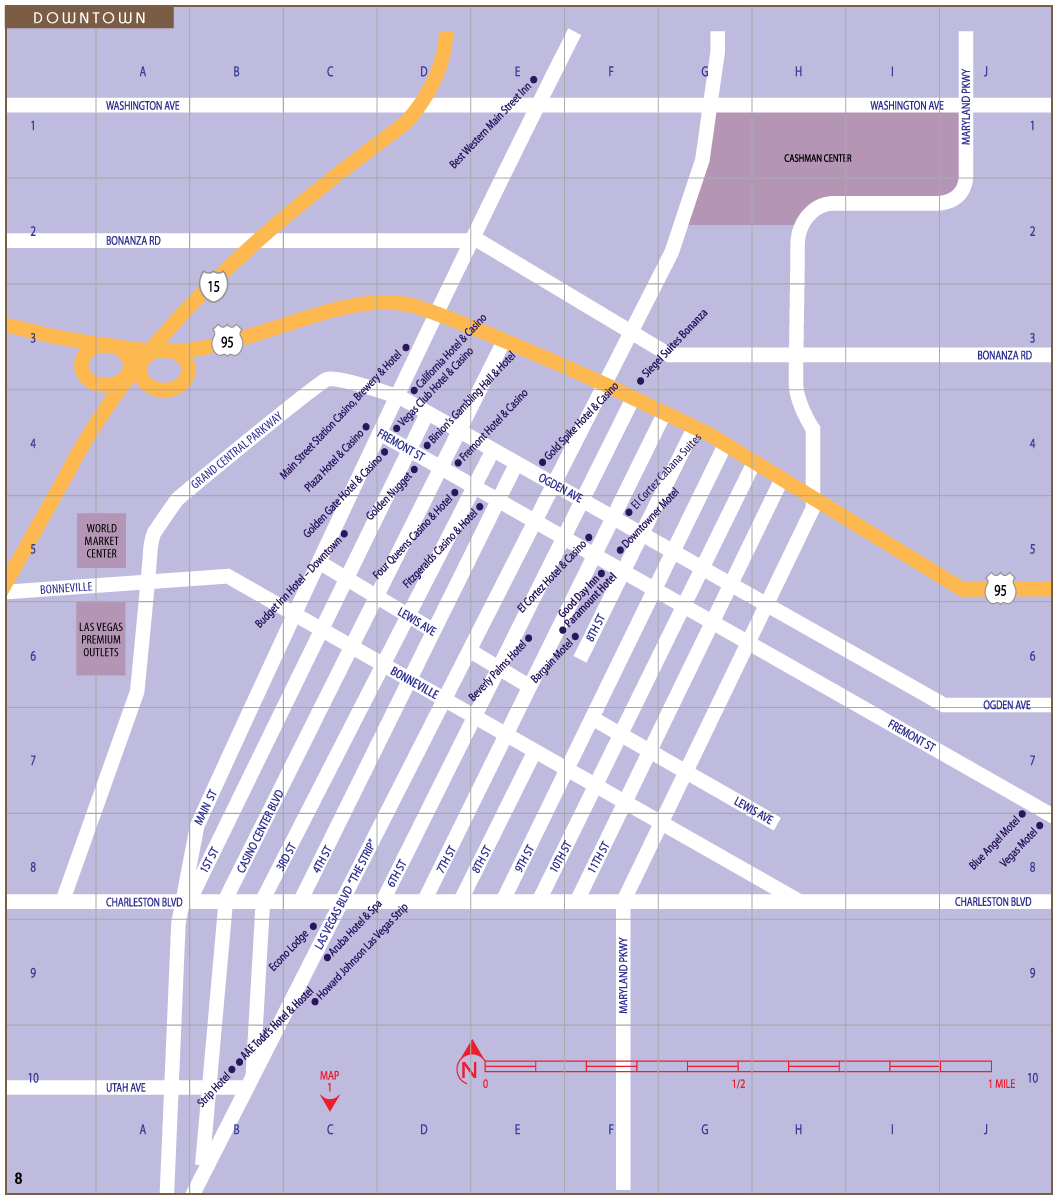 Las Vegas Downtown Hotels Map Mapsofnet - Map of downtown las vegas hotels